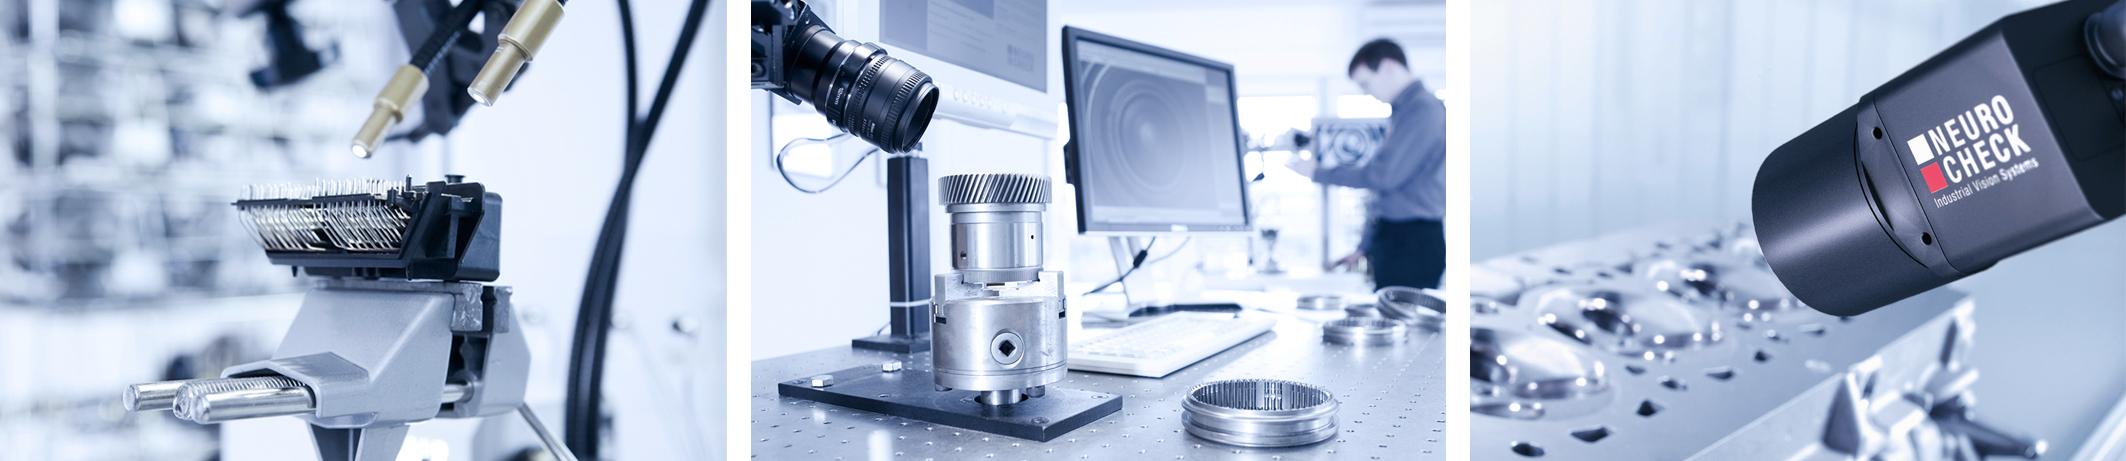 NeuroCheck Komponenten Kompaktkamera (Foto ©NeuroCheck)